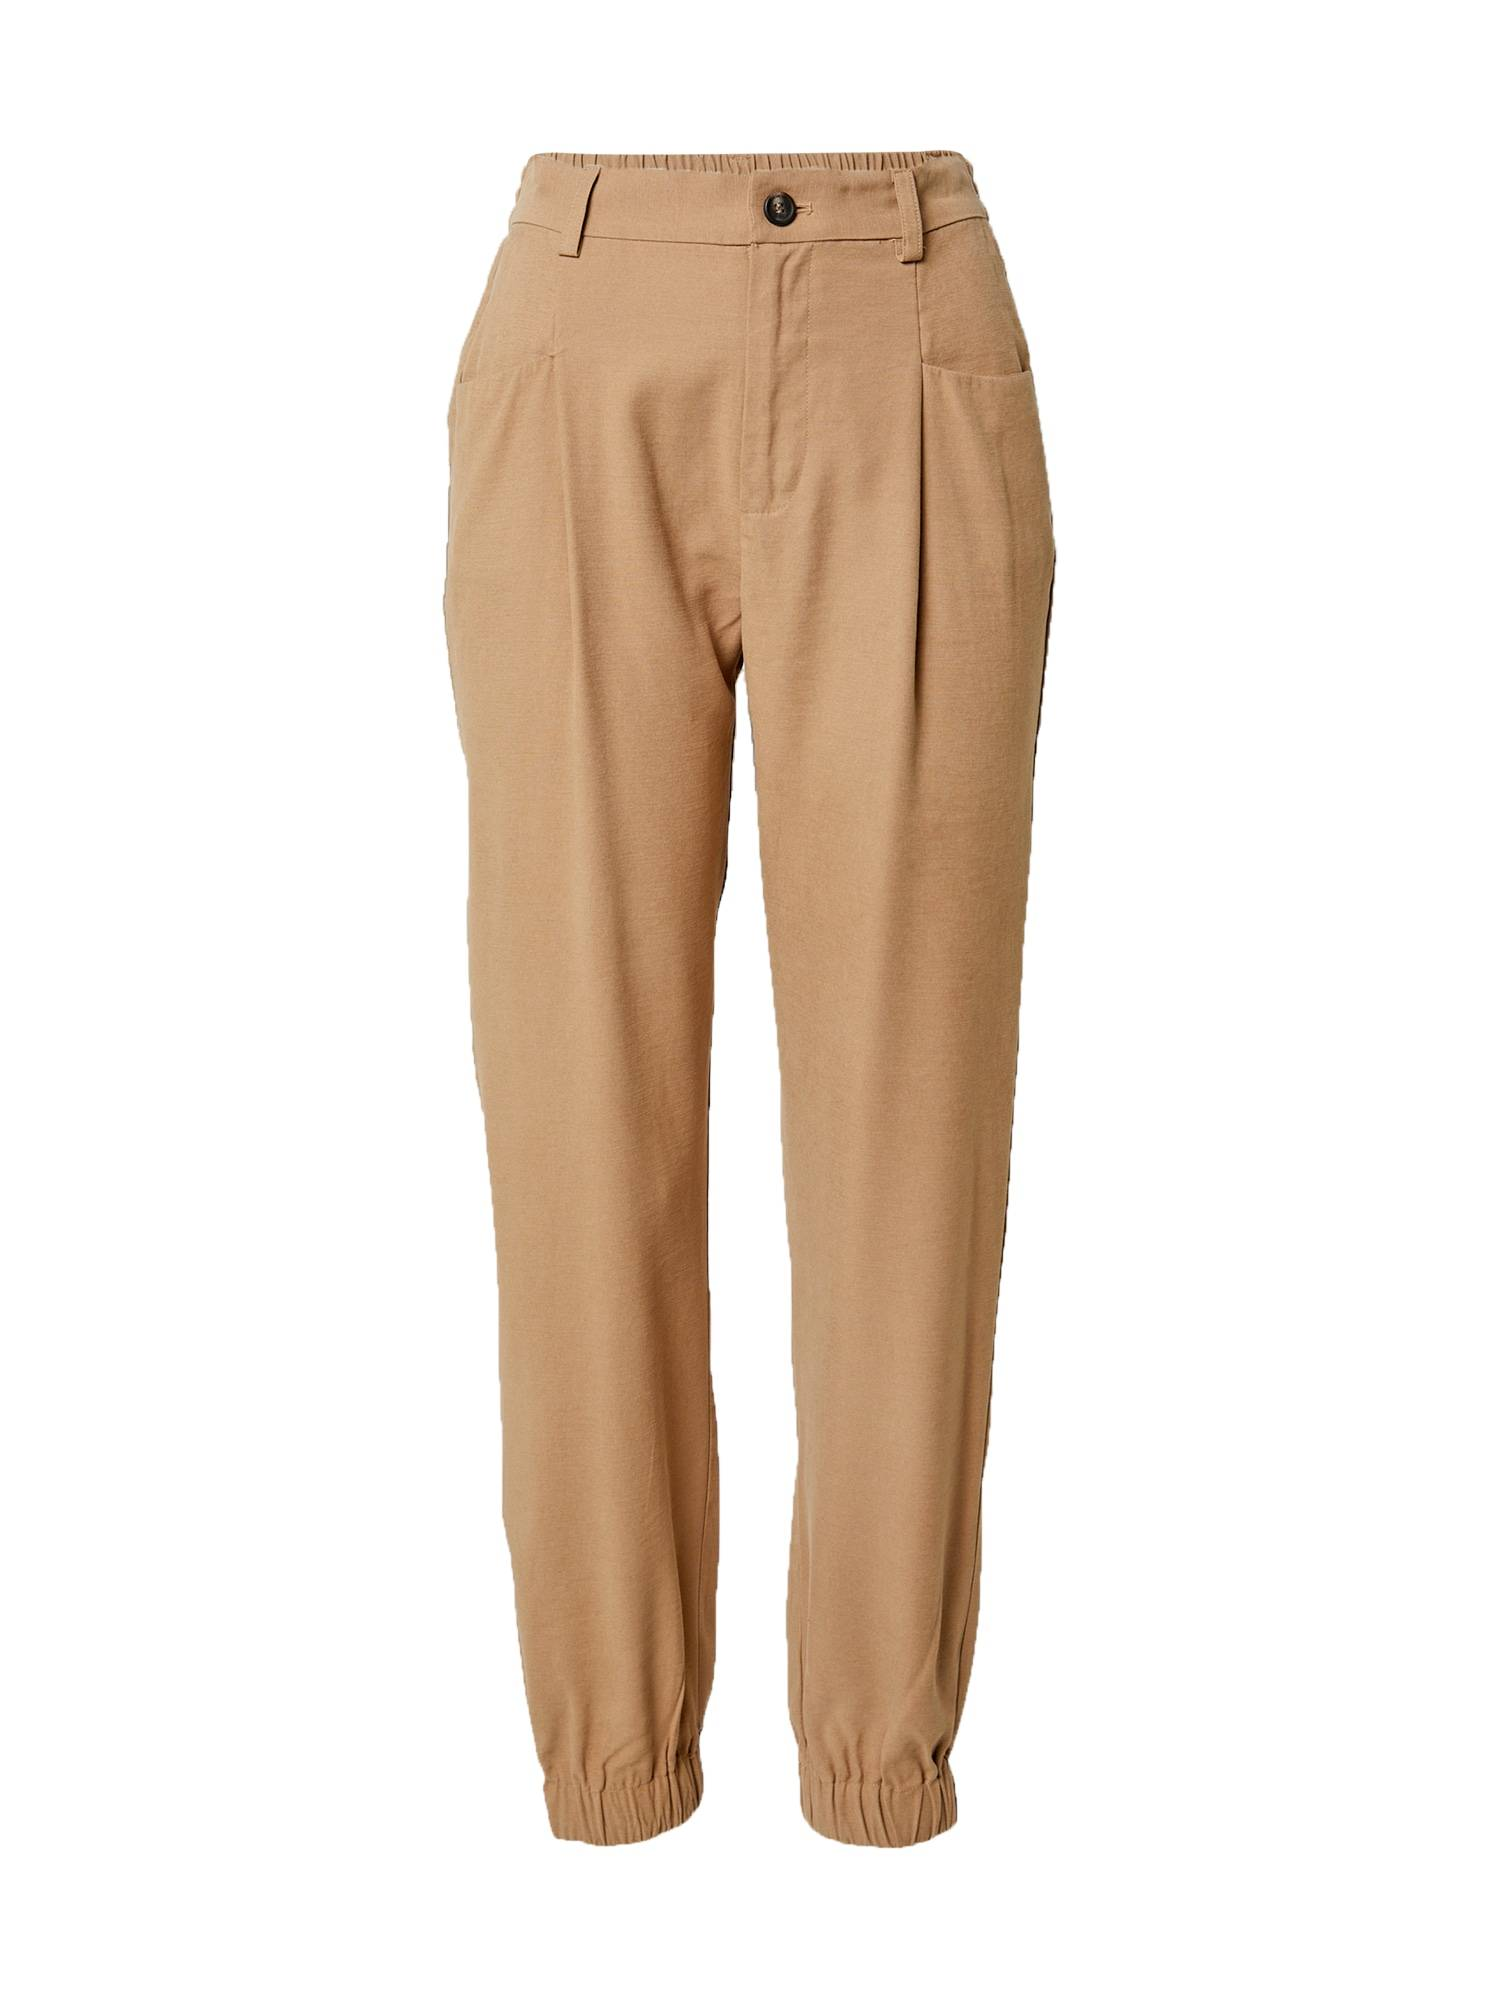 ONLY Pantalon à pince 'Emery'  - Marron - Taille: L - female